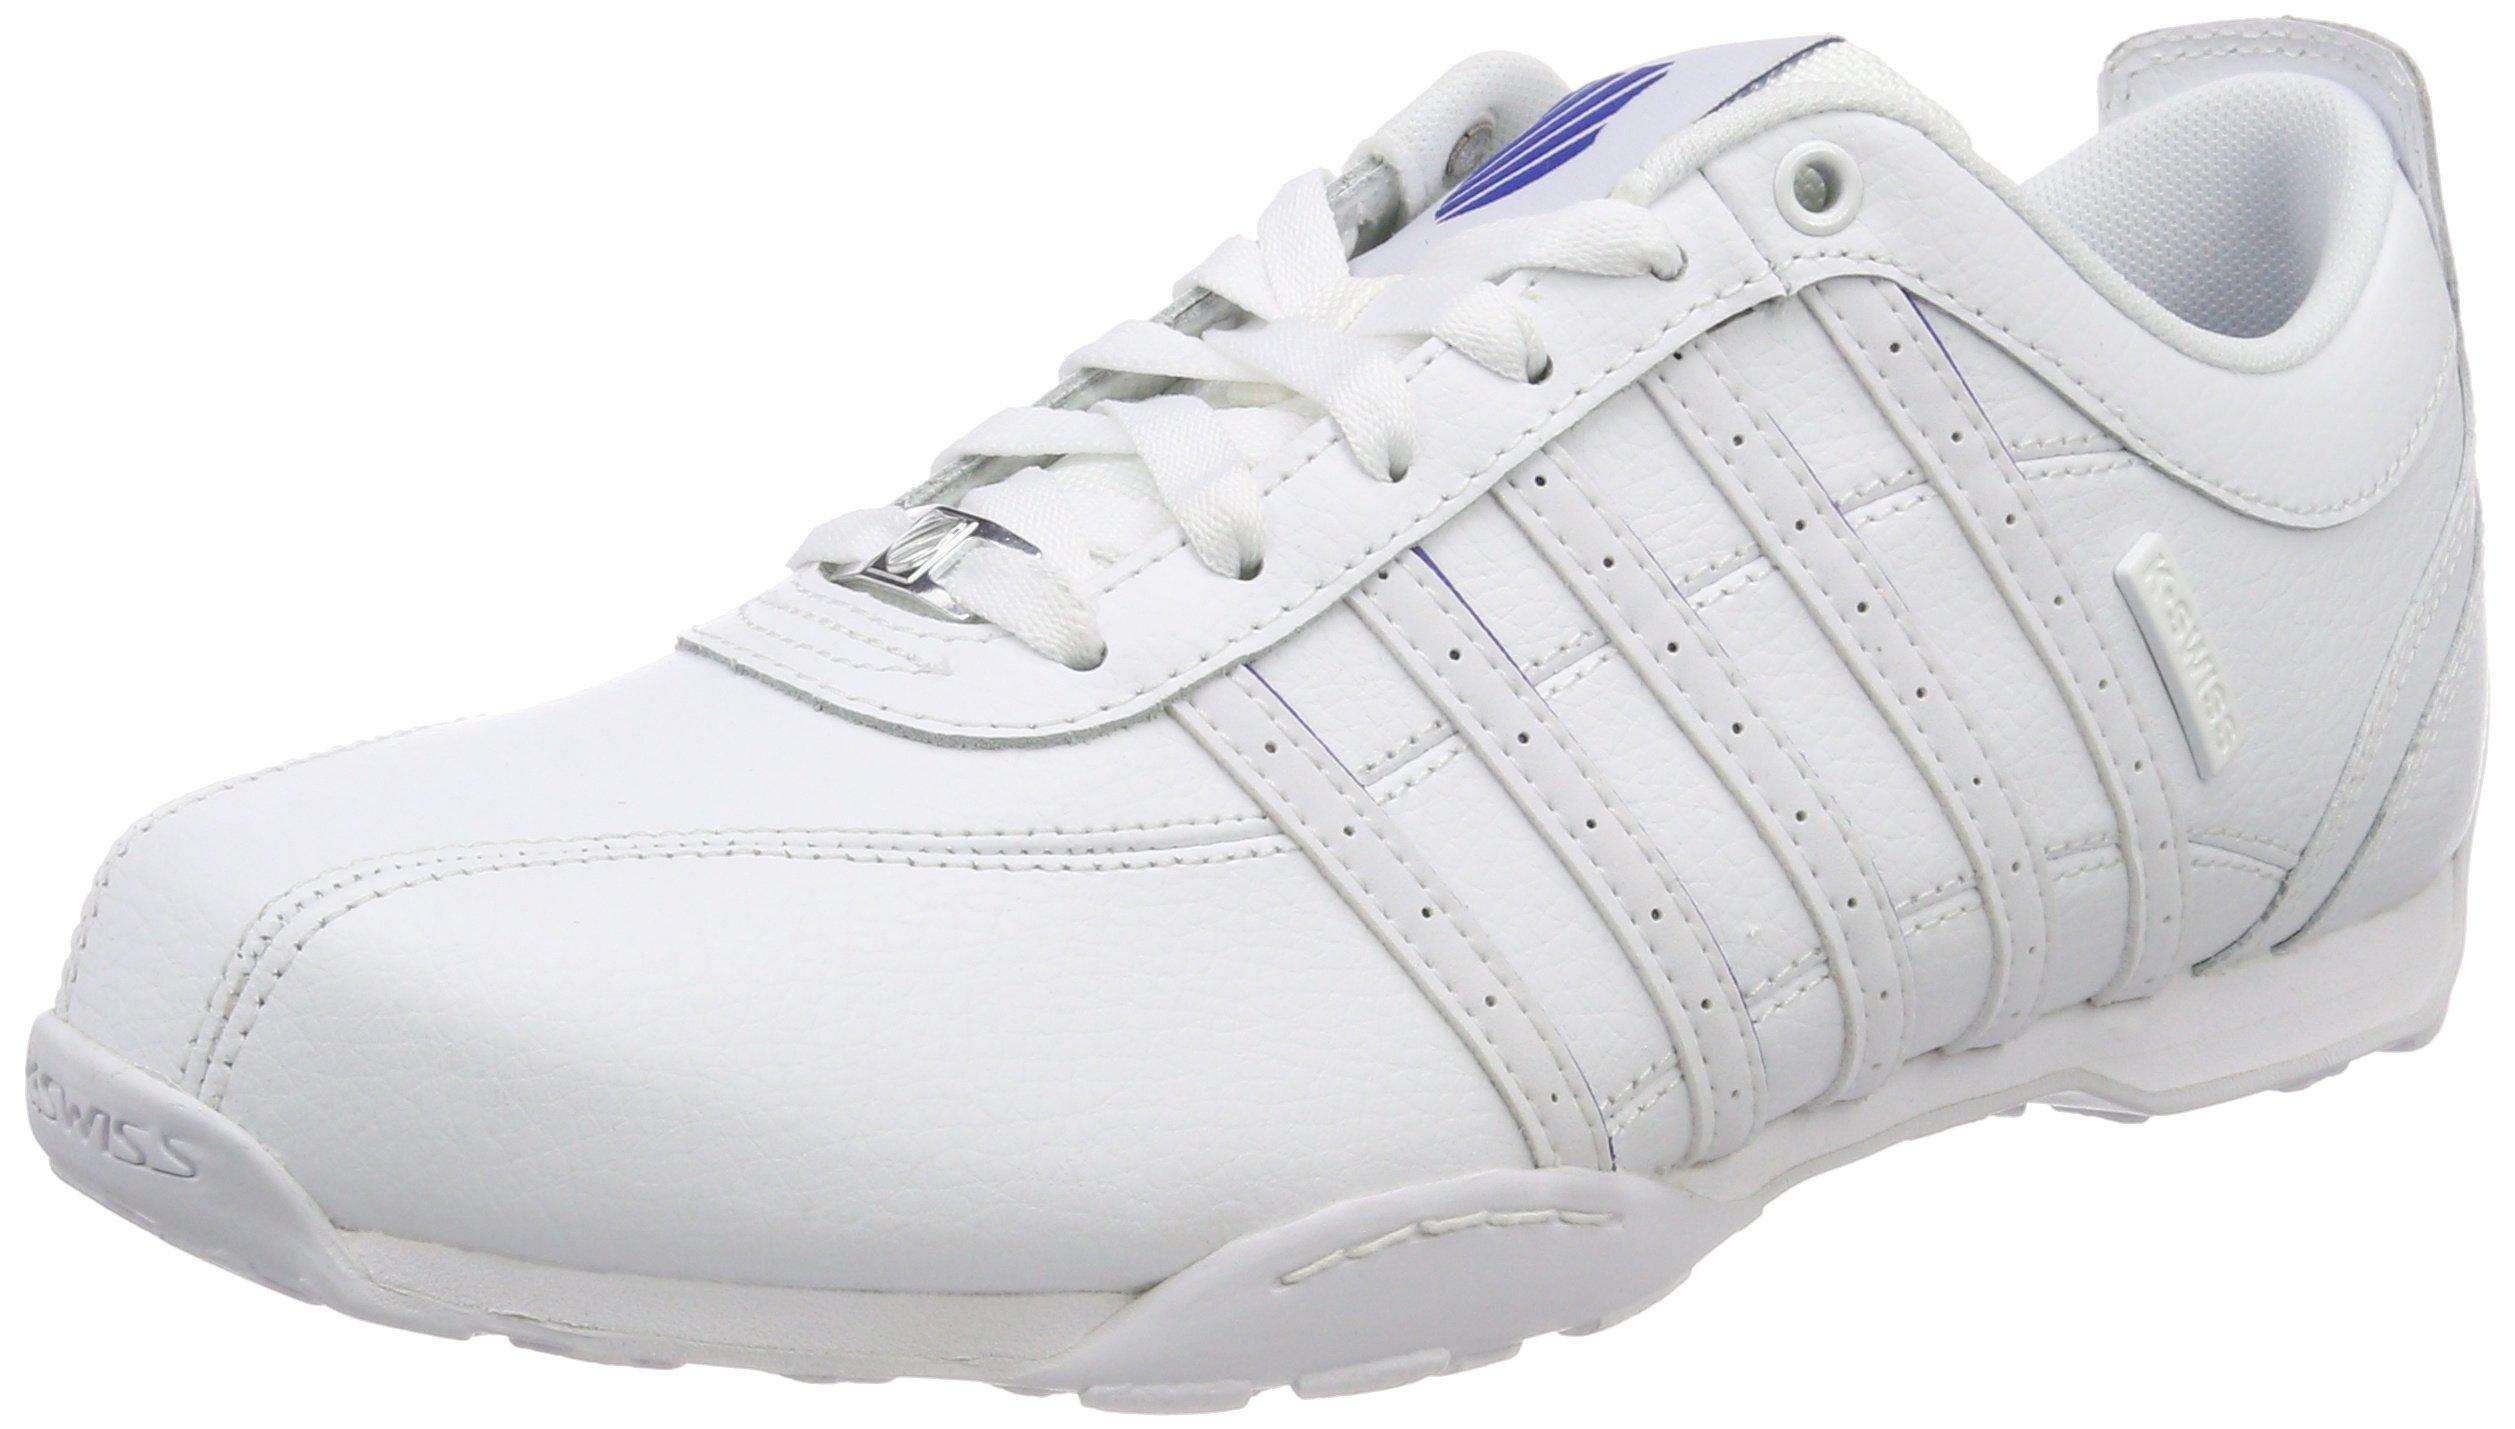 1 Arvee 5Sneakers Eu HommeBlanc Blue41 K Basses classic swiss White lF1cJTu3K